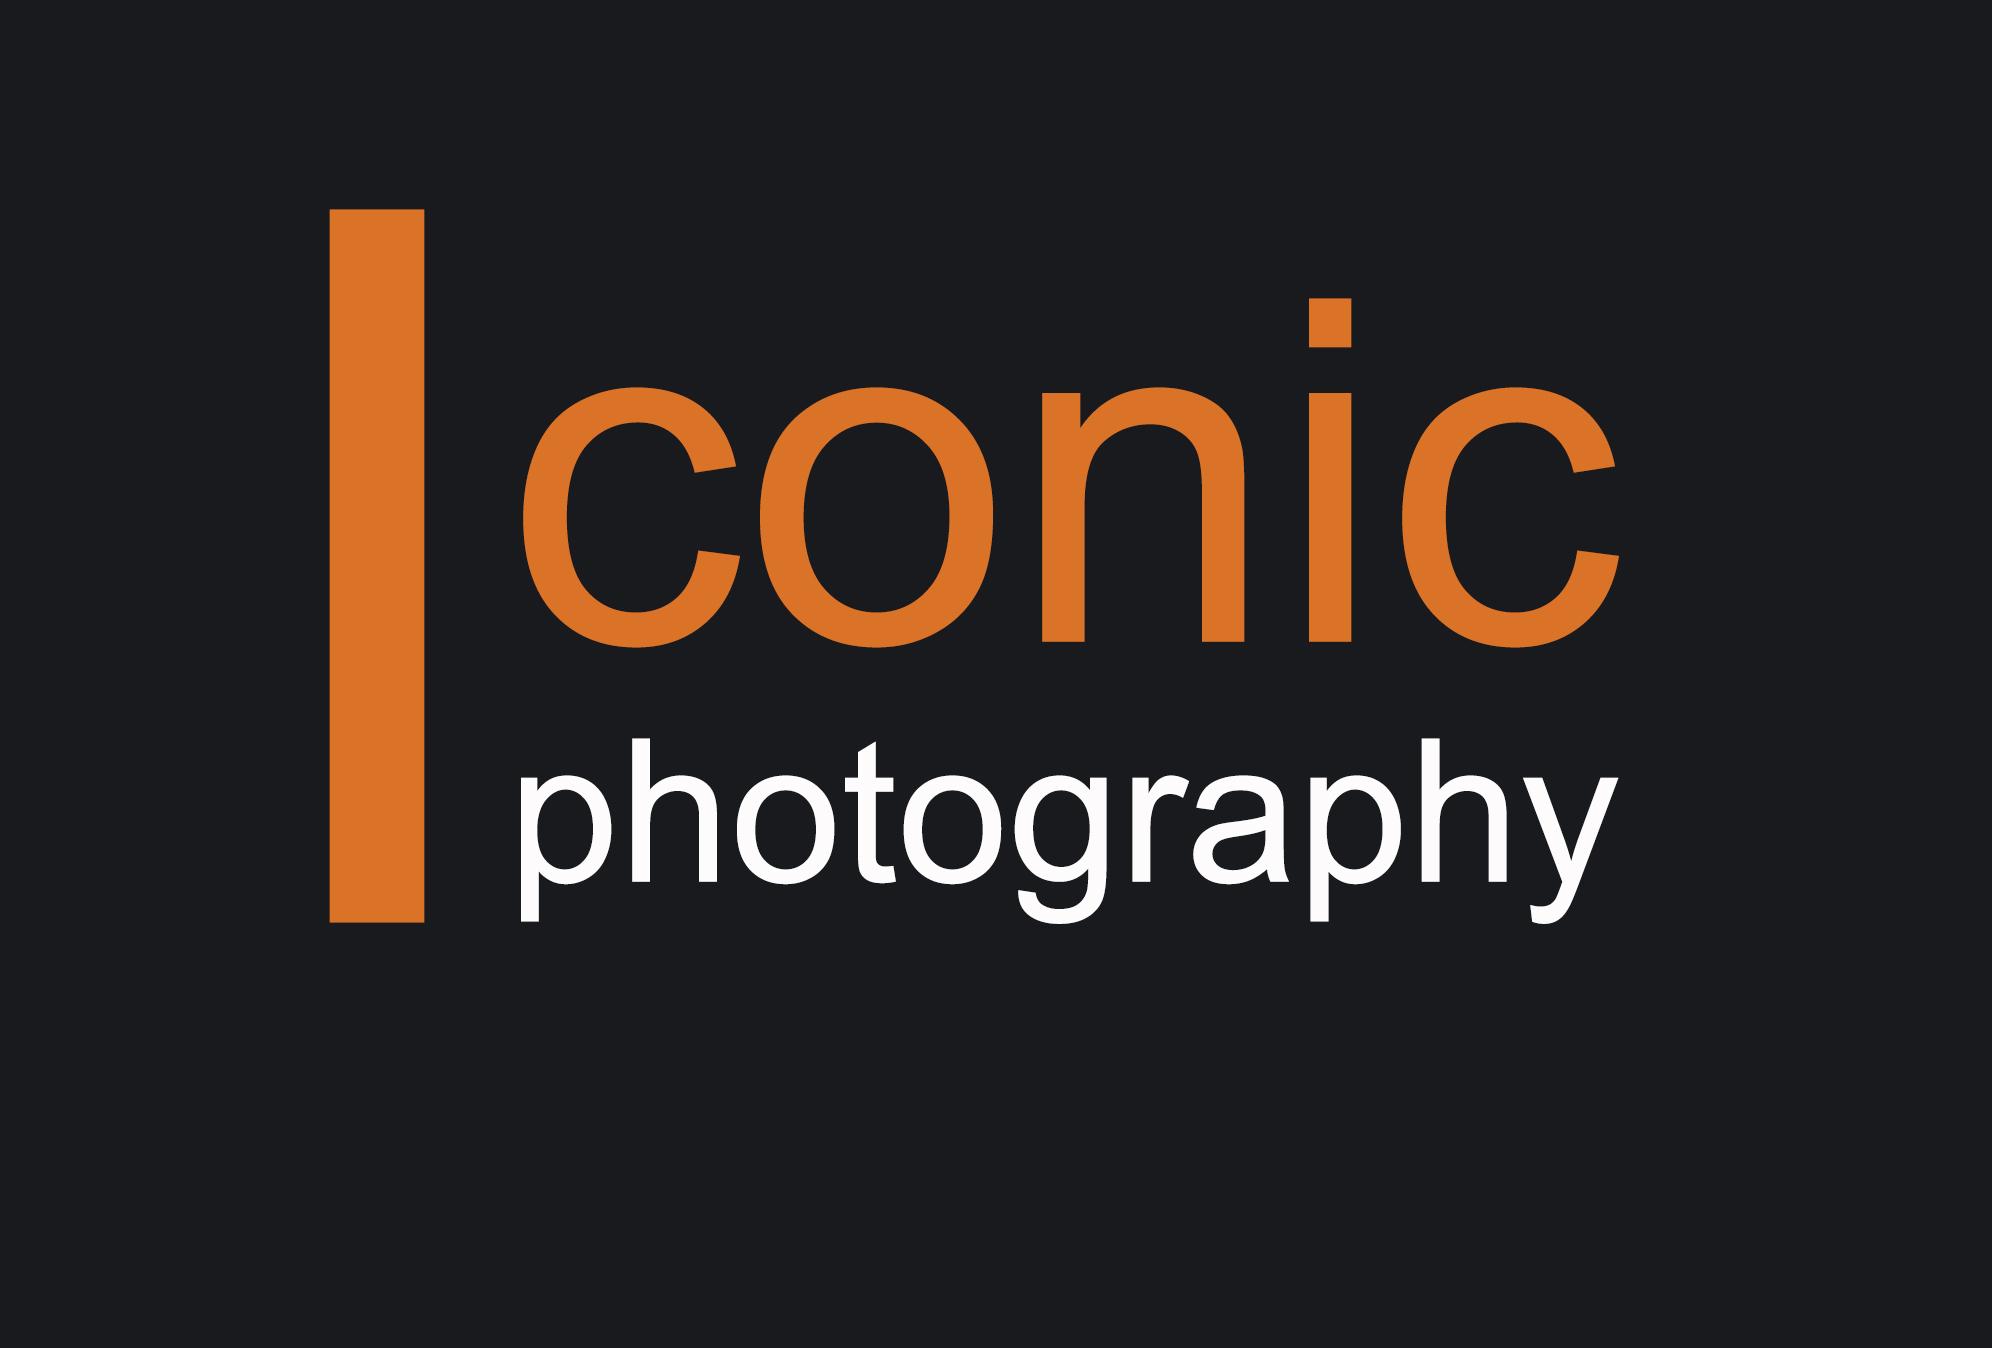 Chris Malcolm Photography